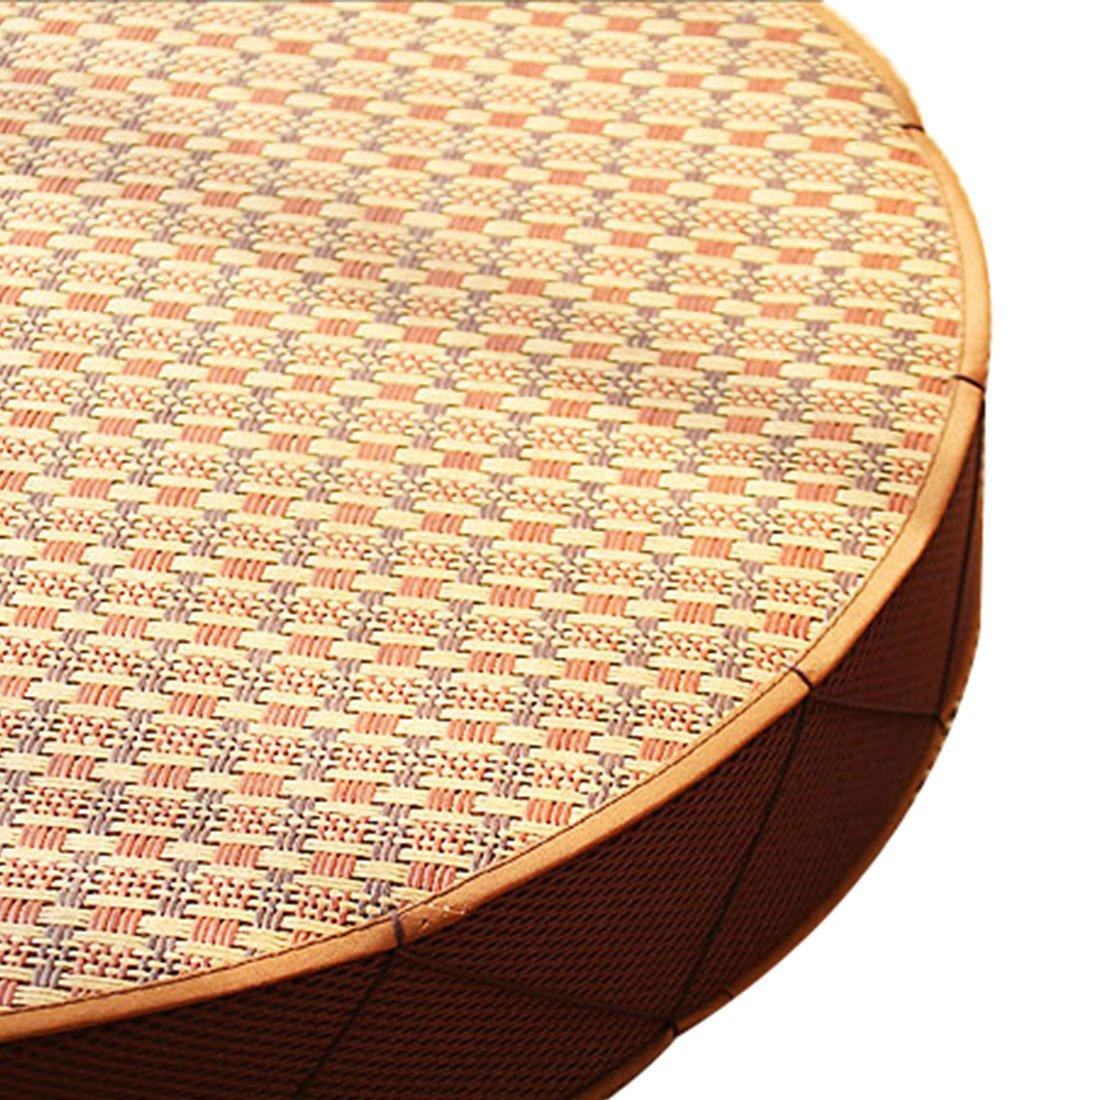 Round Wood Tree Soft Plush Chair Seat Cushion Stump Shaped Pillow 11.8x1.6inch by Fandim Fly (Image #3)